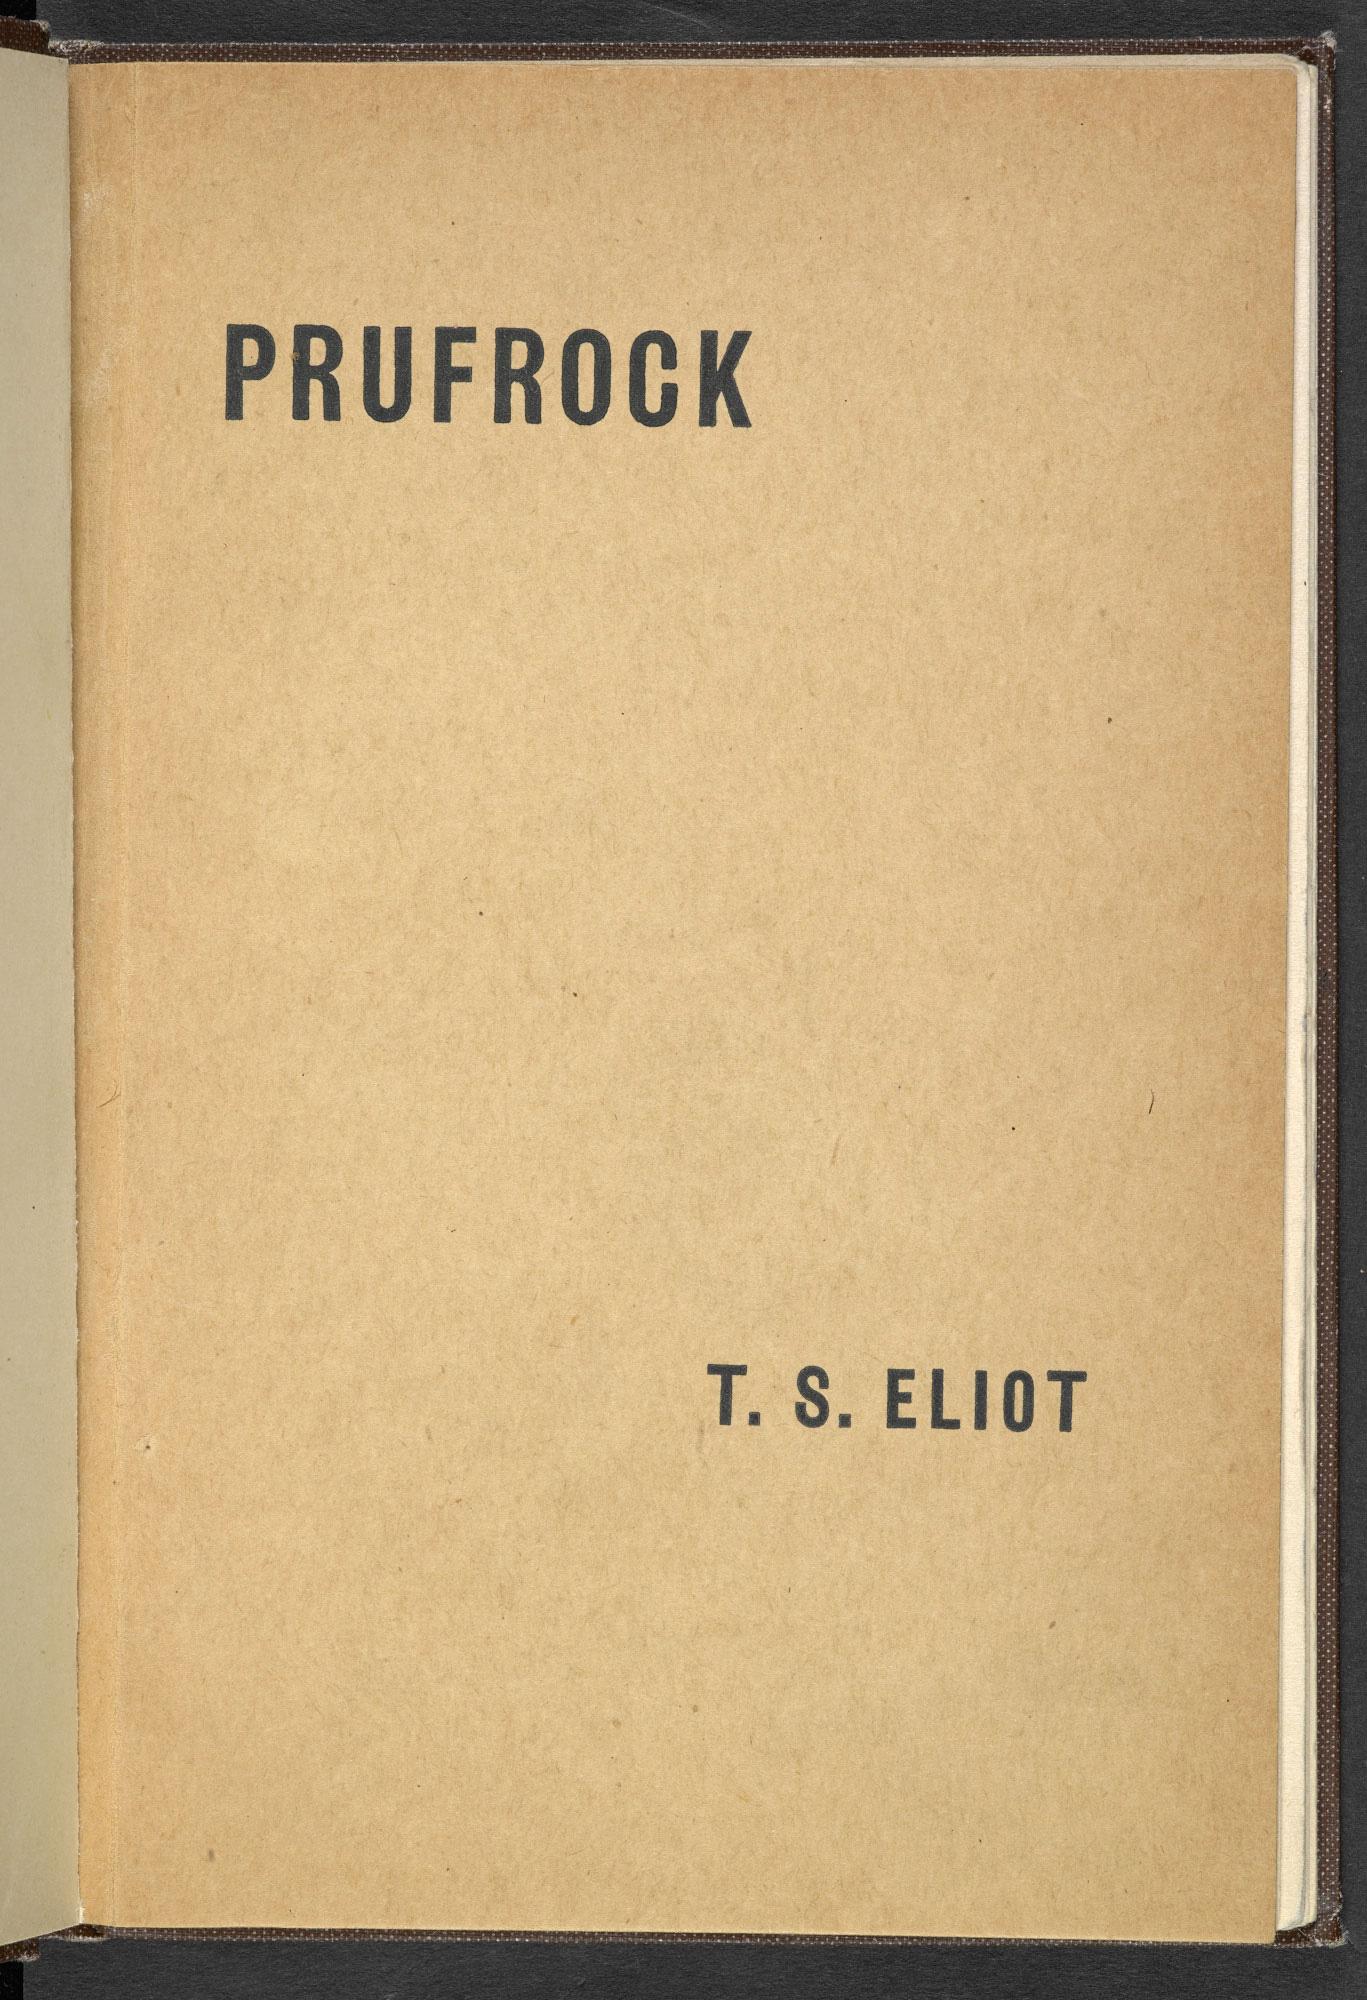 eliot prufrock